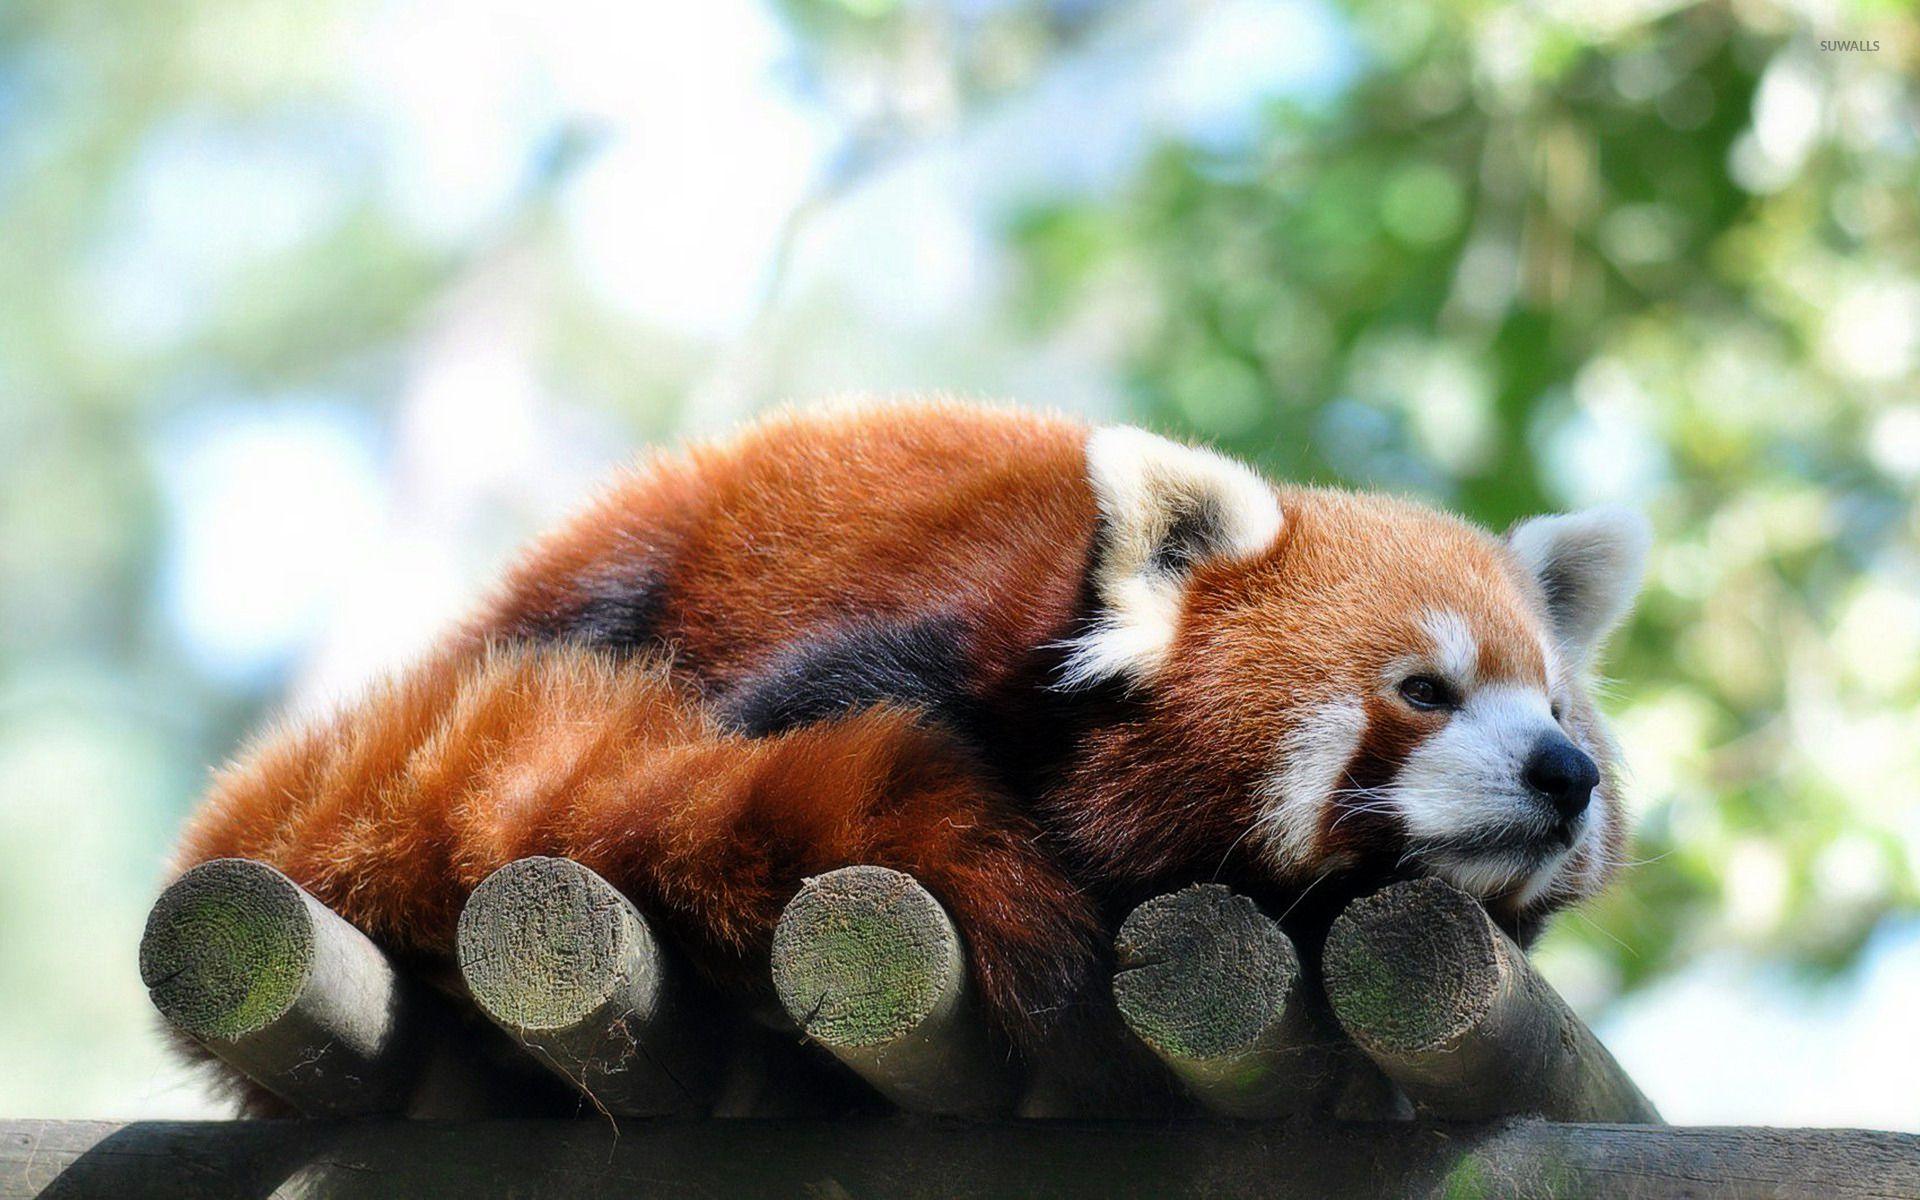 Red Panda Computer Wallpapers Desktop Backgrounds X Red Panda Panda Wallpapers Panda Bears Wallpaper